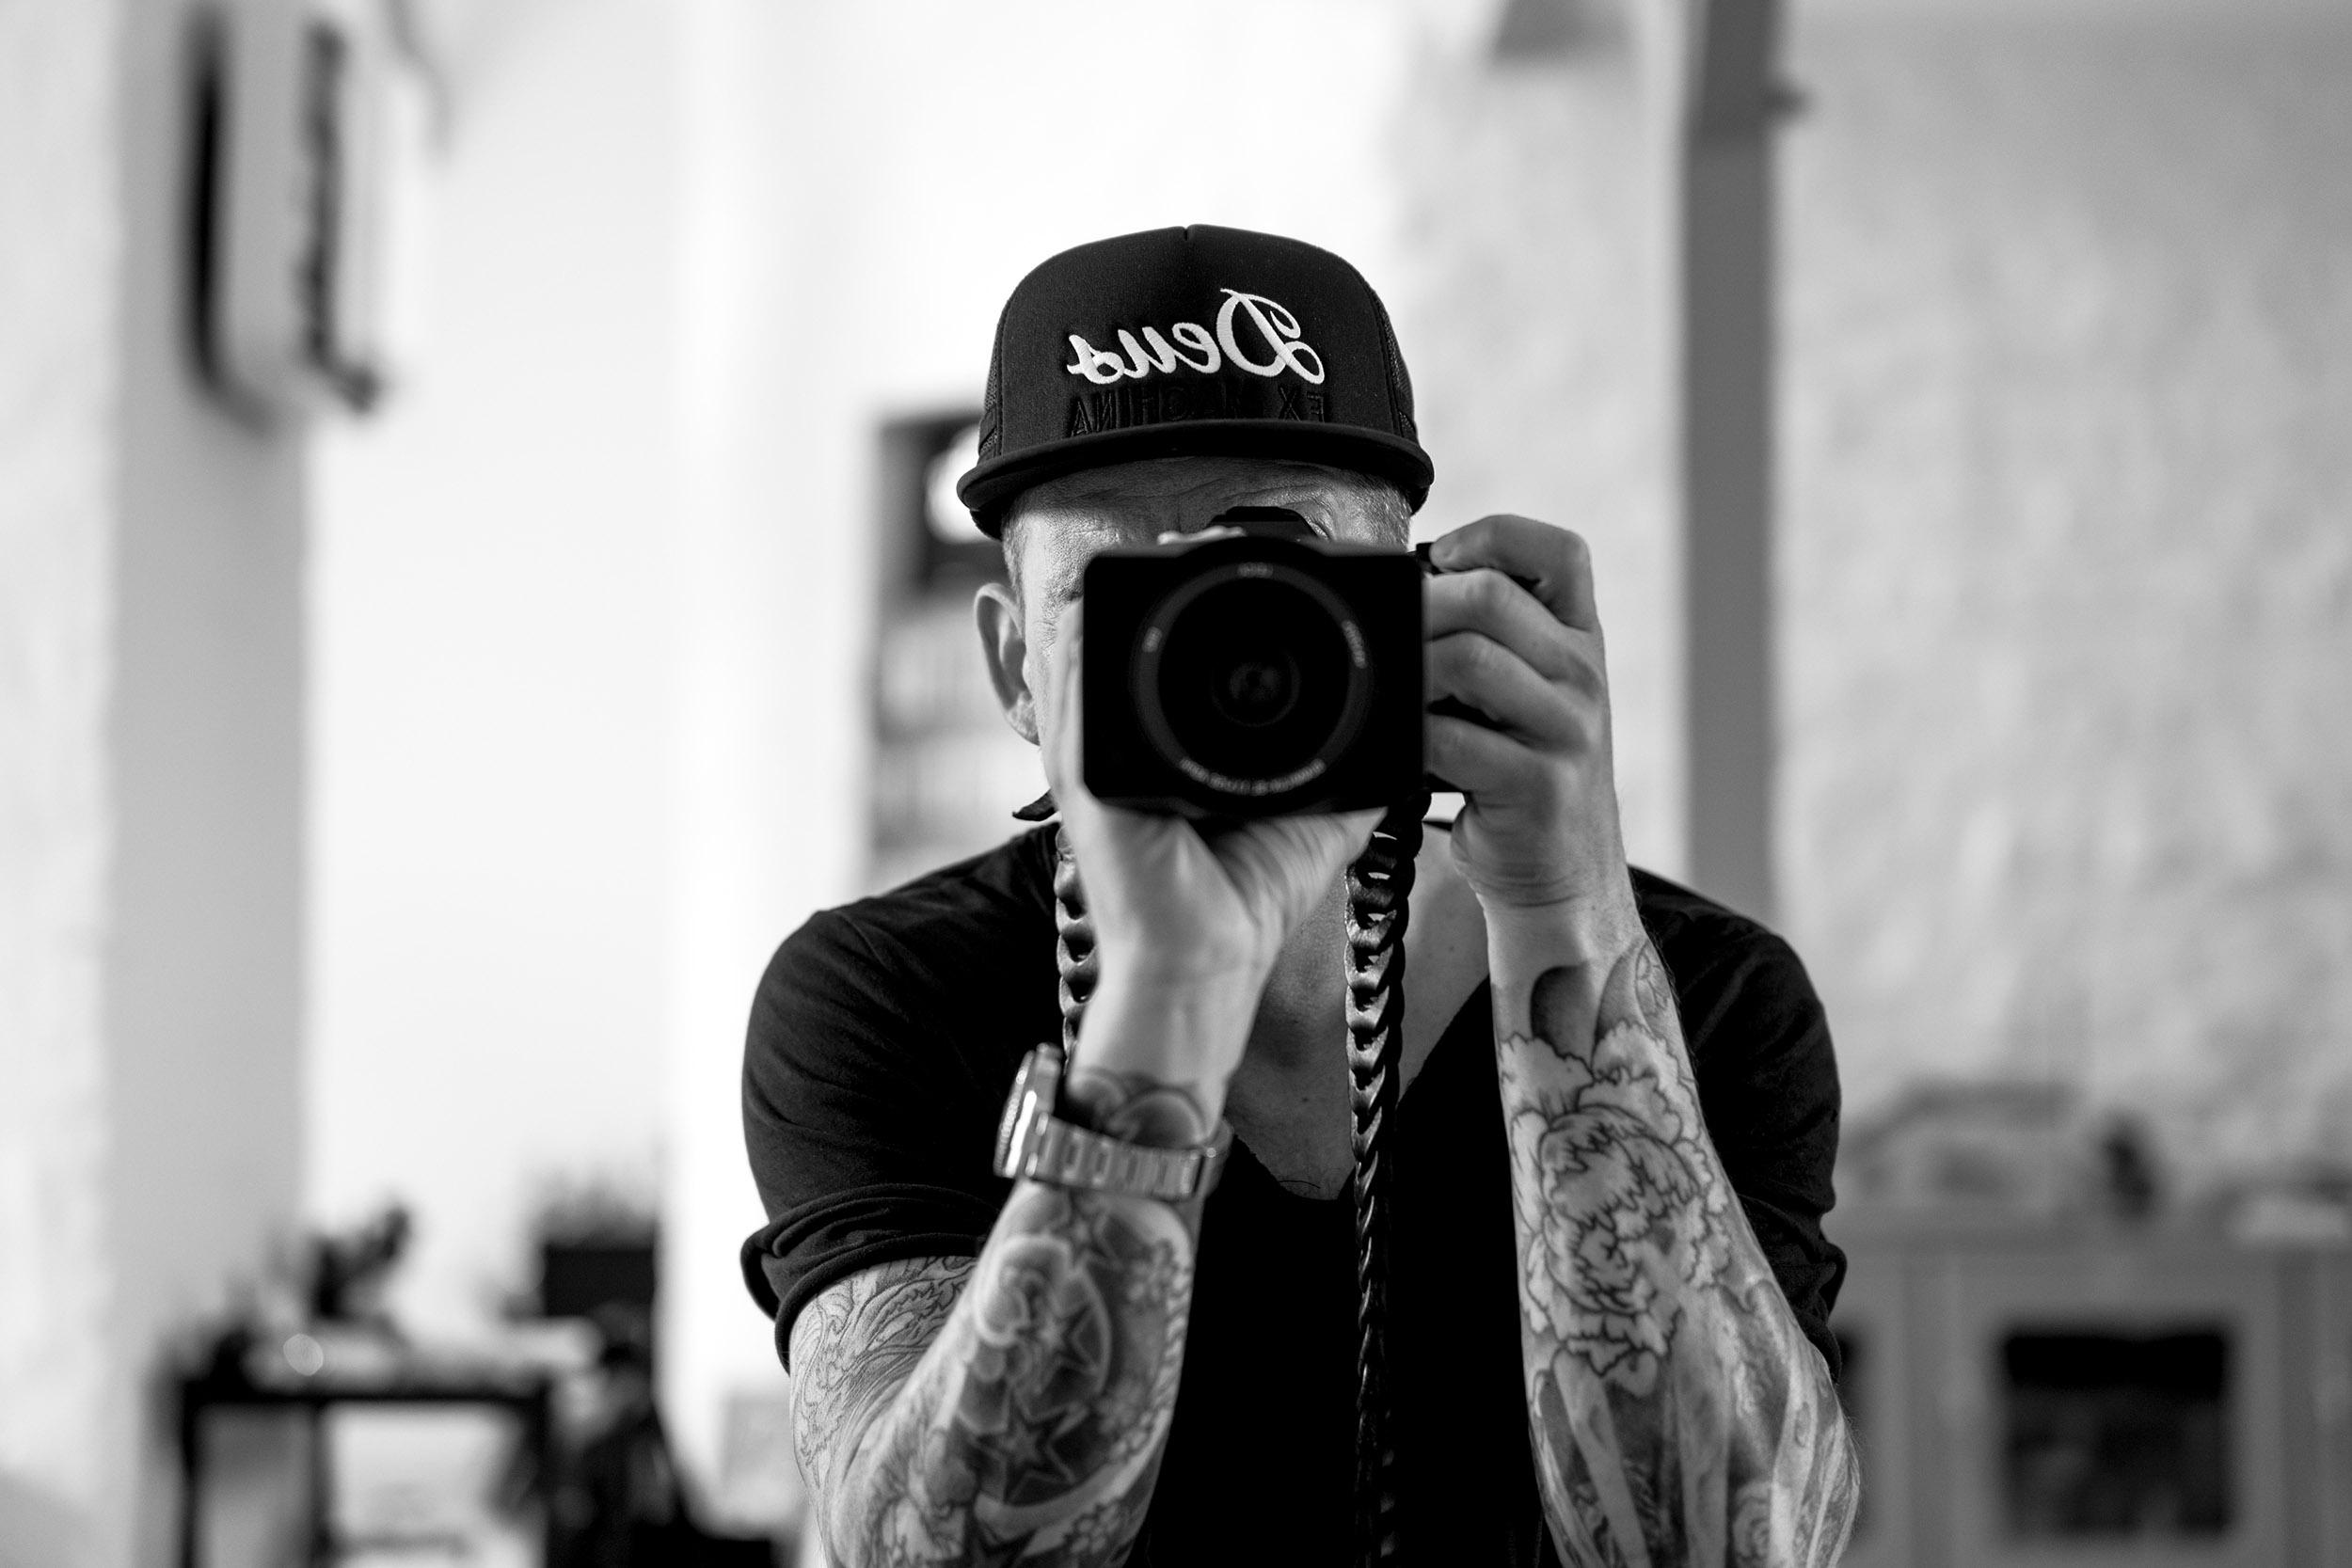 StefanTrocha-Selfie-1080796.jpg